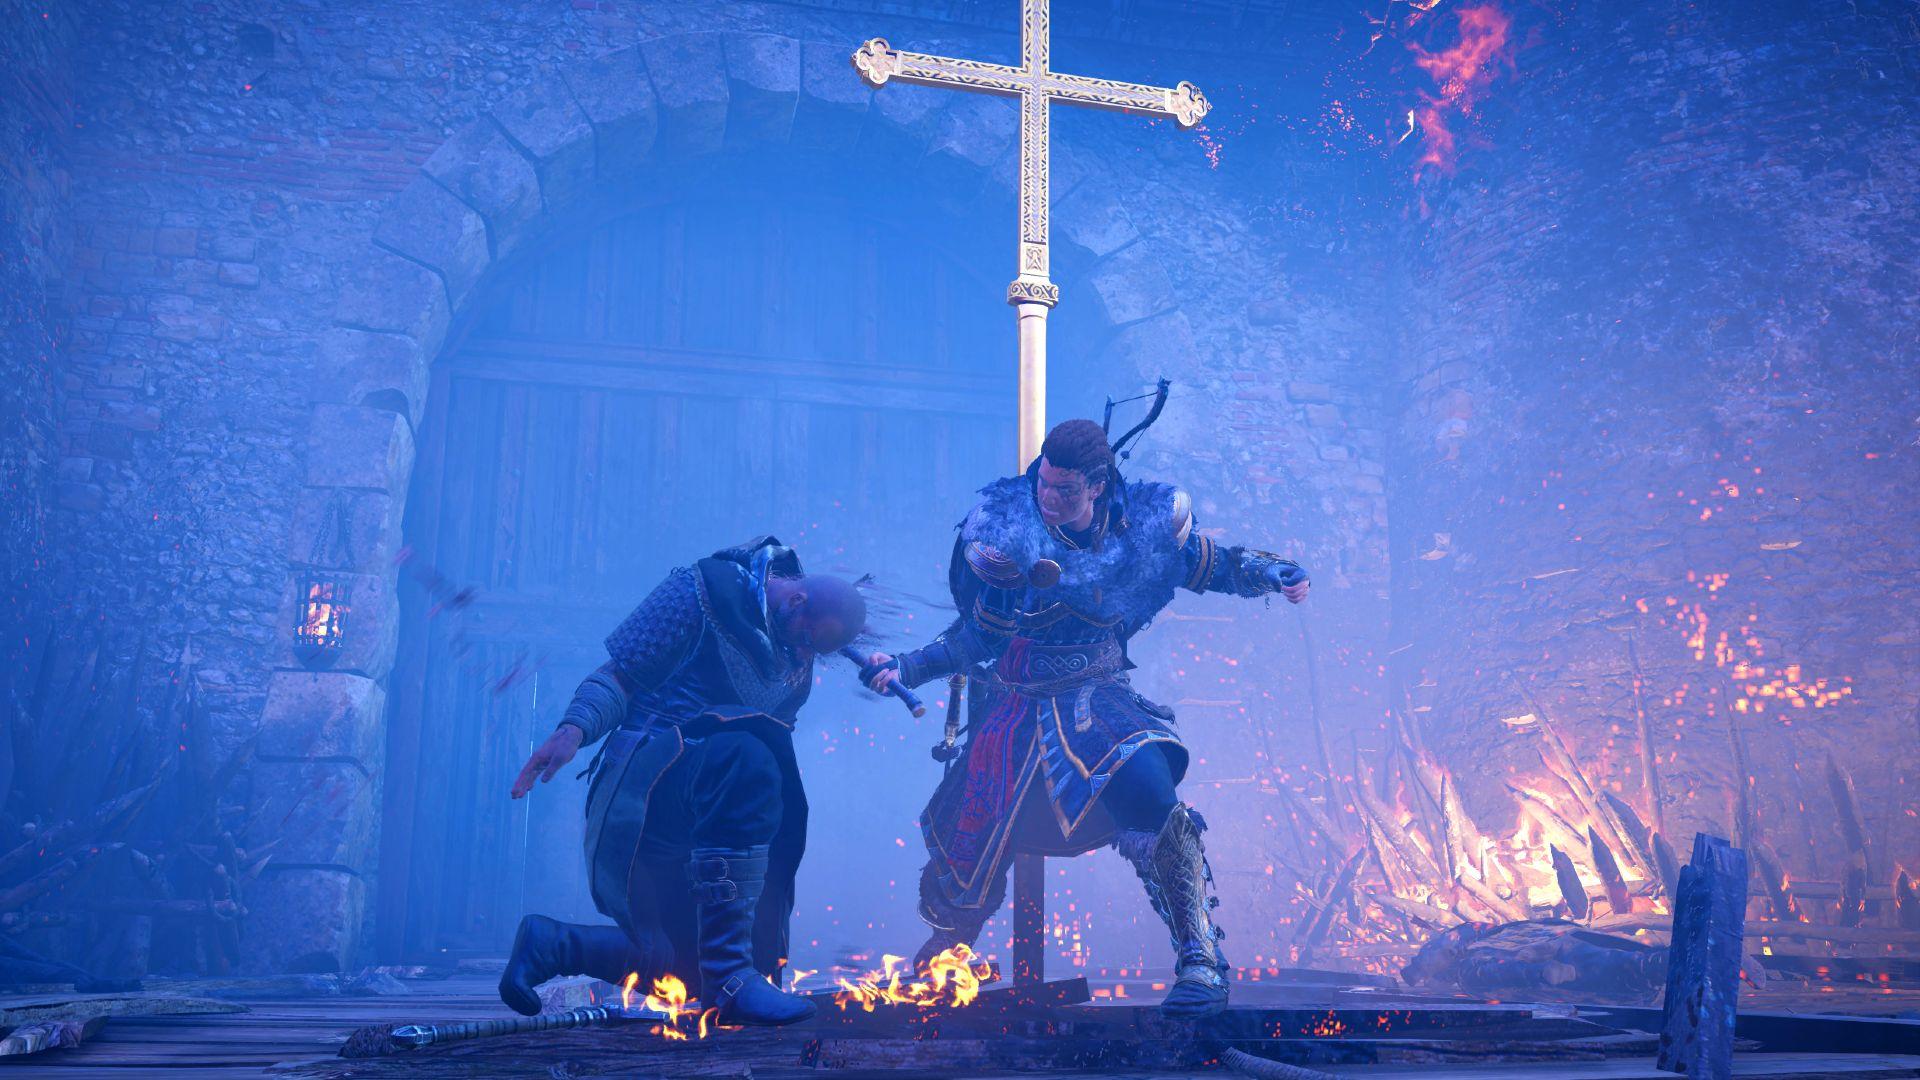 Assassin's Creed Valhalla: The Siege of Paris review – Bon voyage